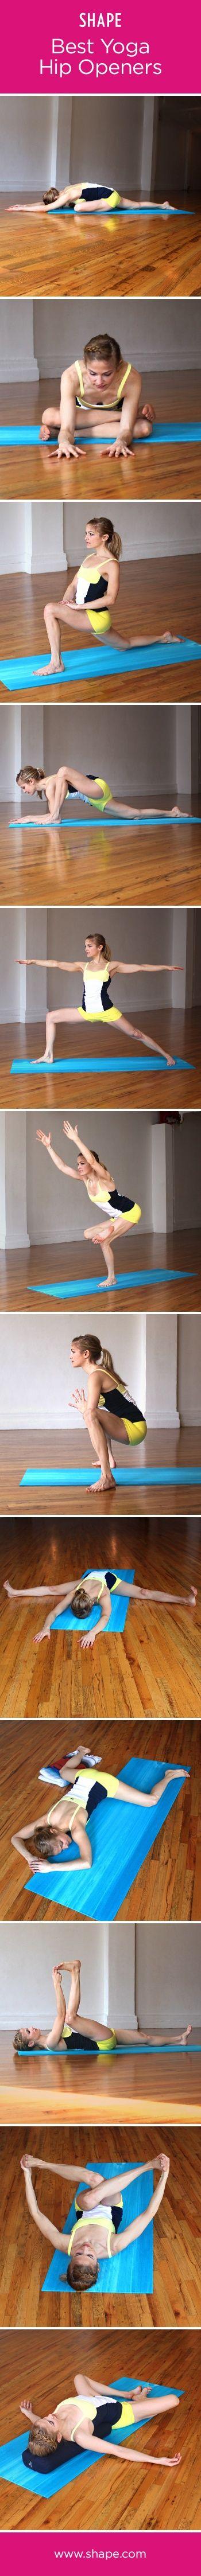 Yoga proven to improve balance for stroke victims